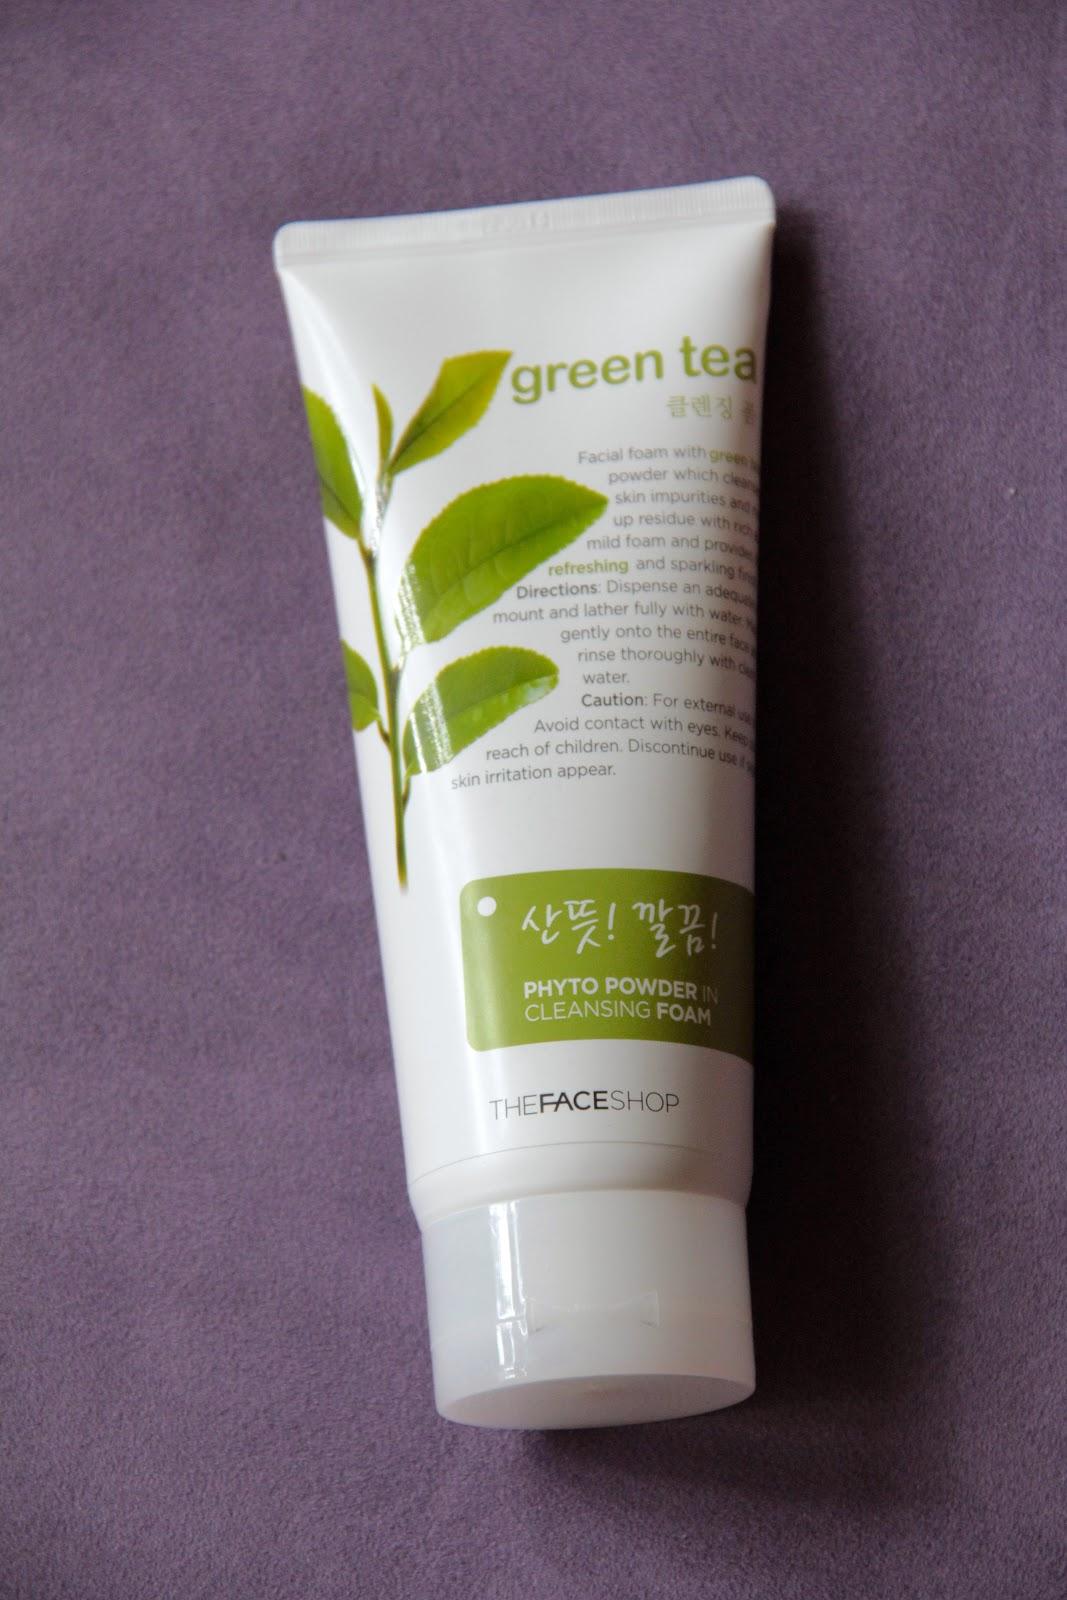 Amazoncom: green tea powder for face mask